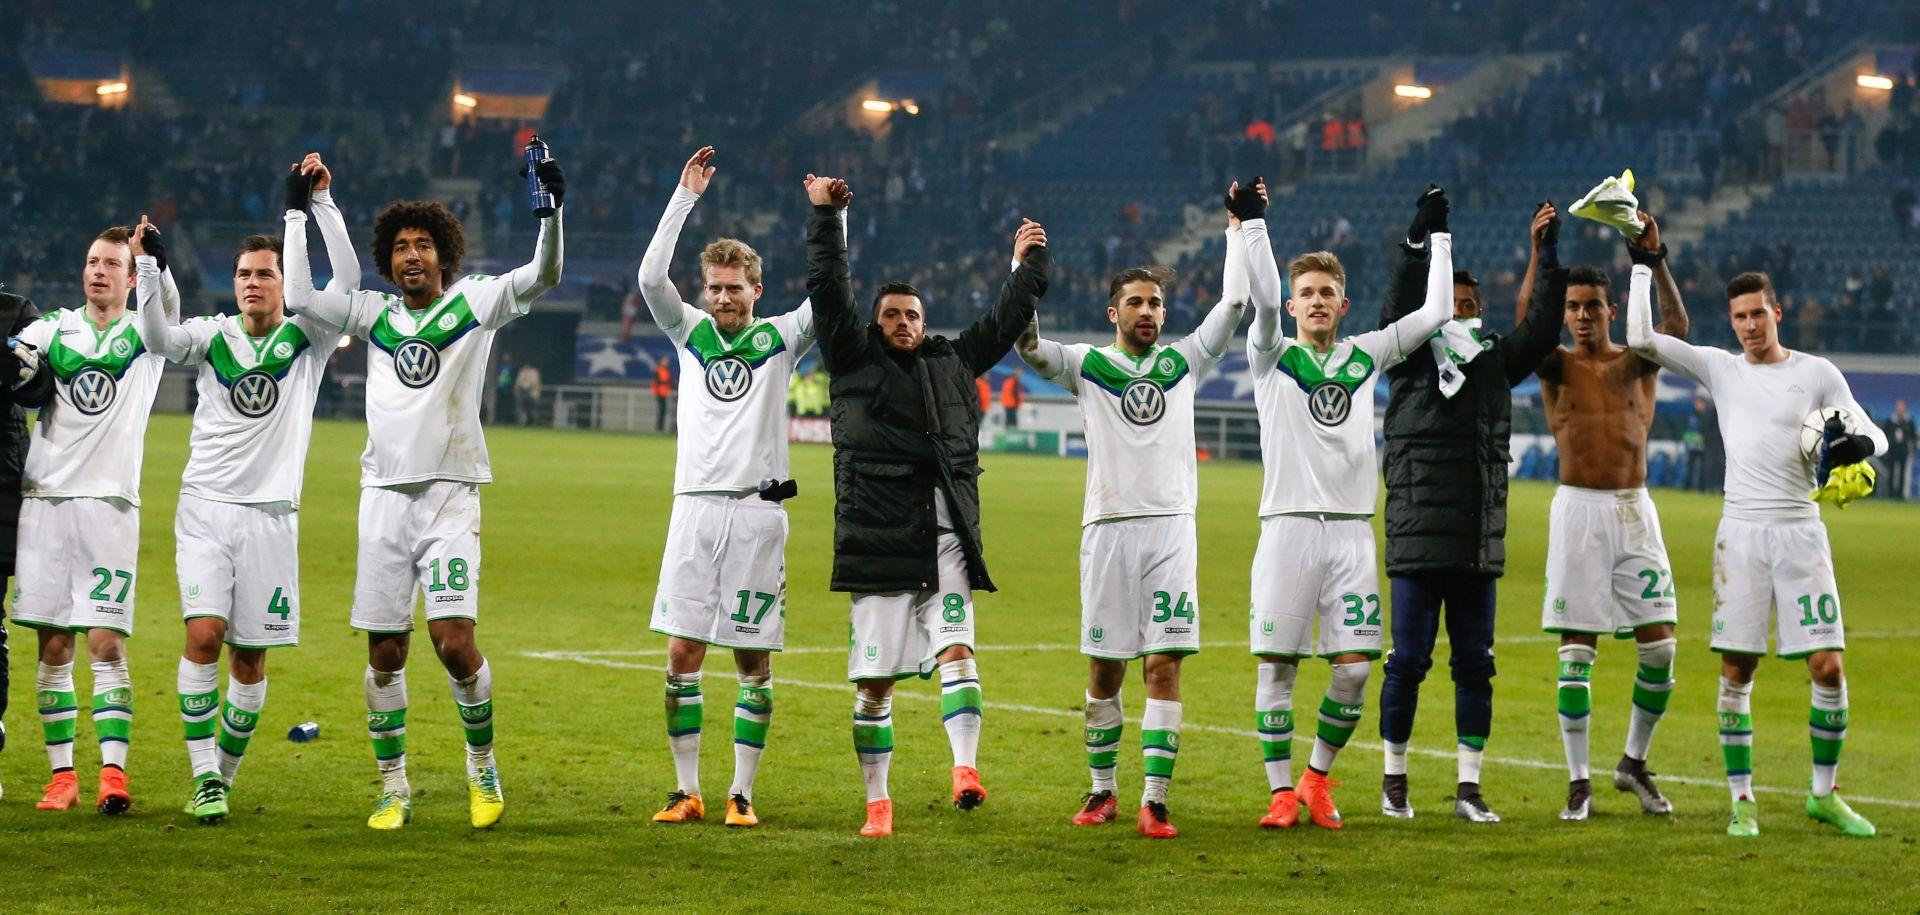 LIGA PRVAKA: Pobjede Reala i Wolfsburga